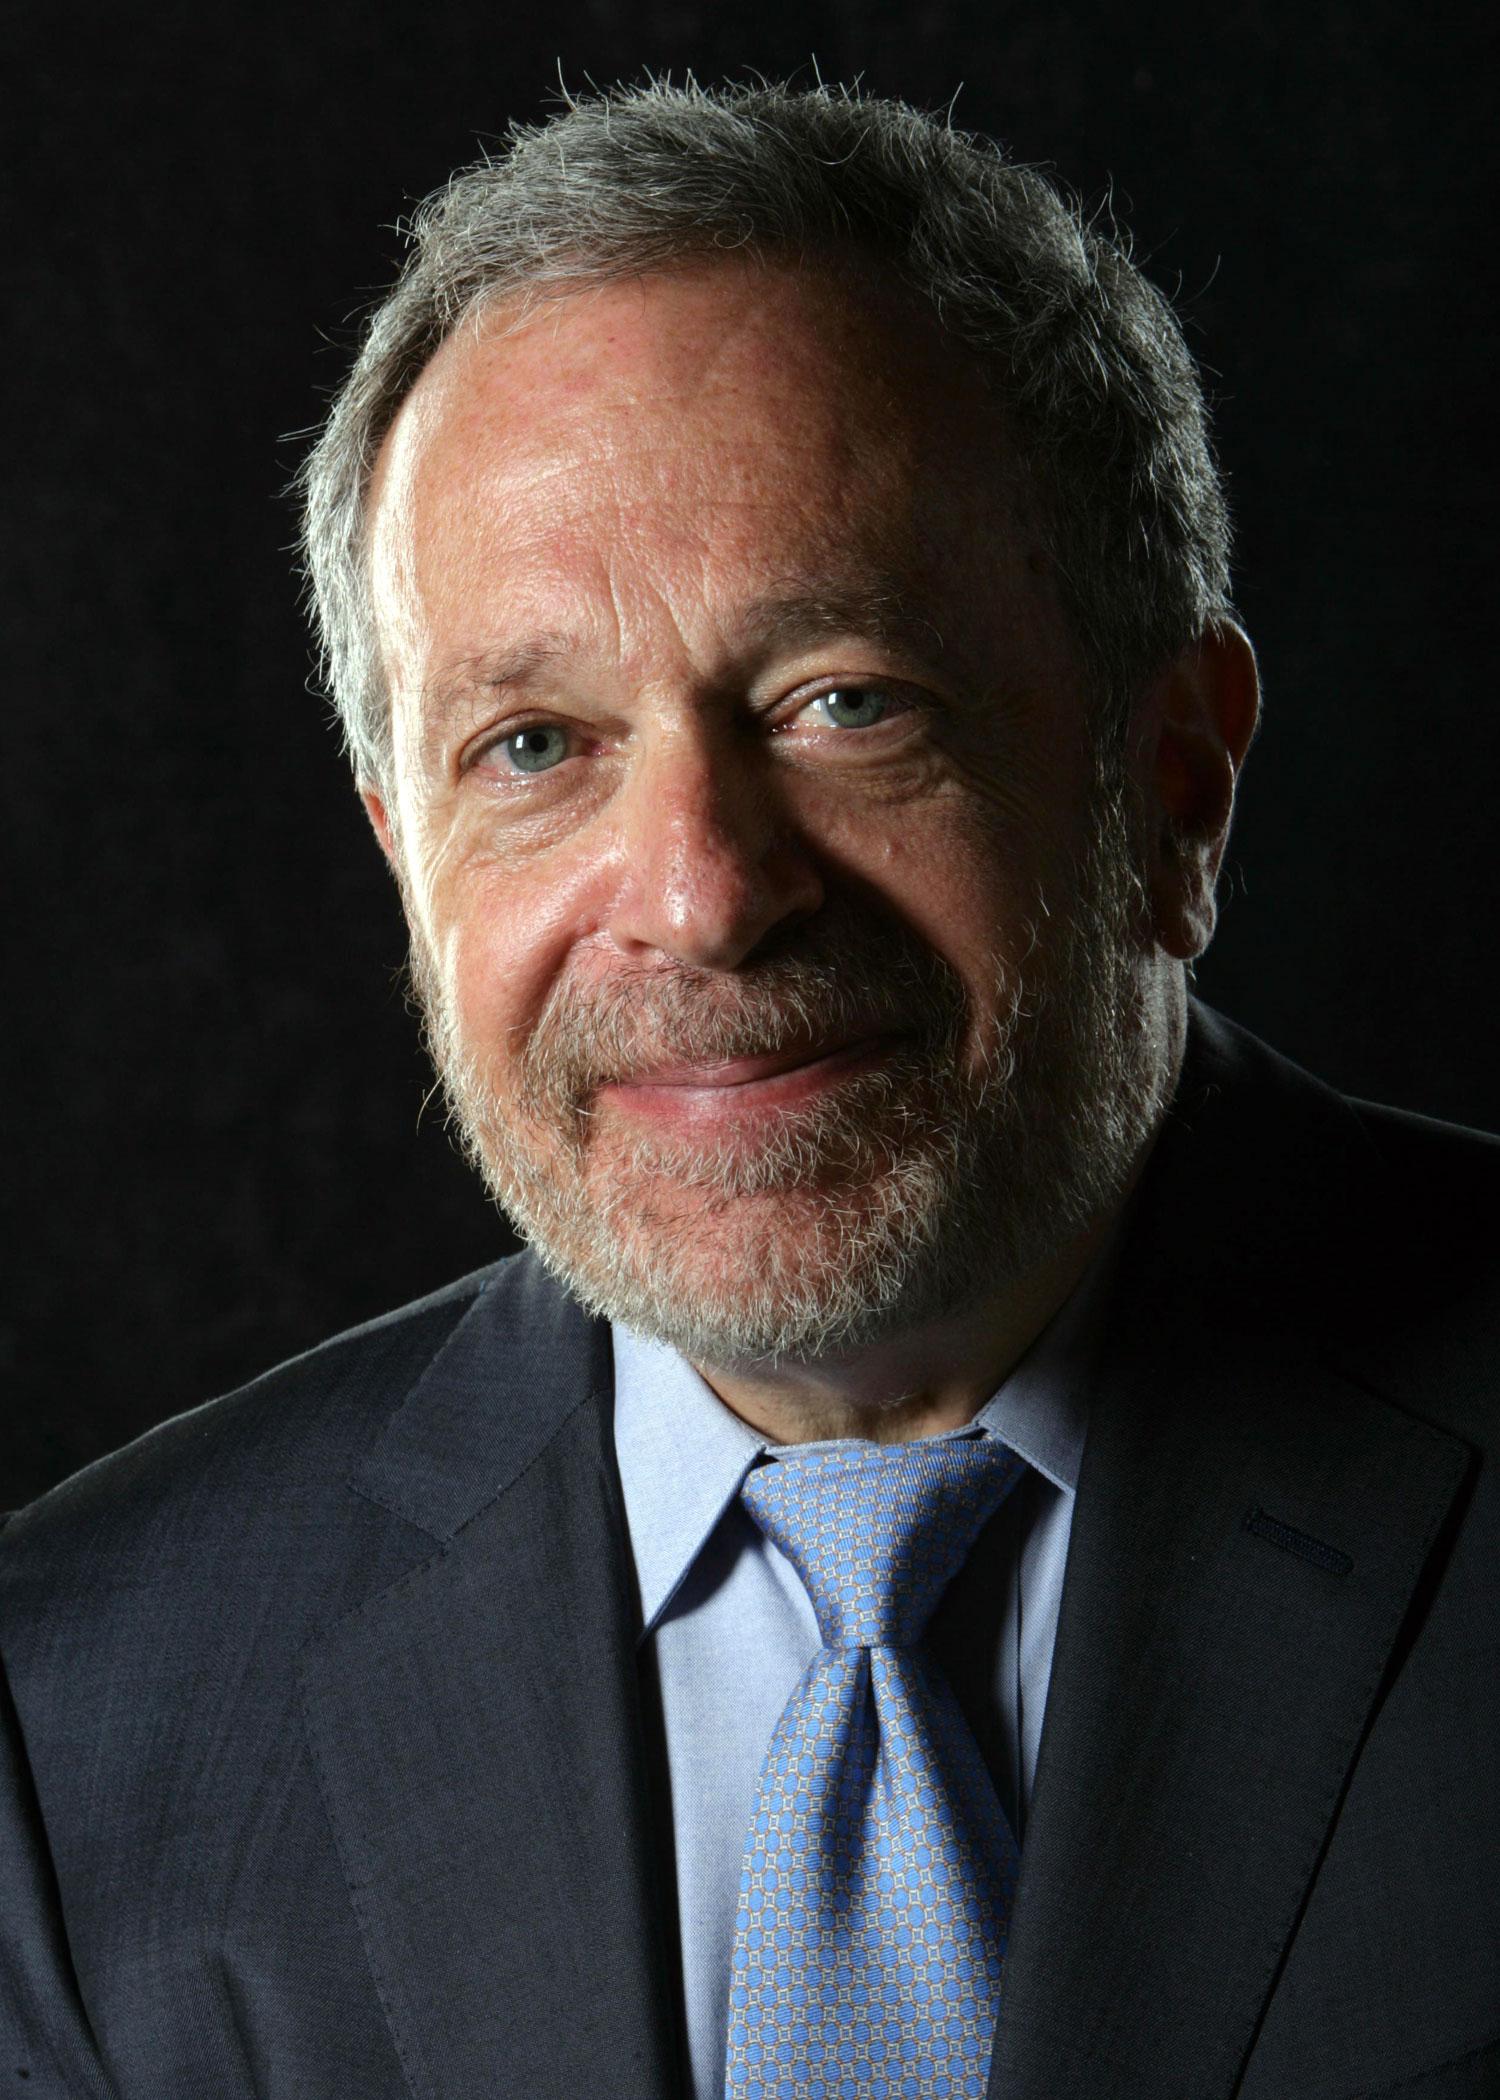 SLCC Hosts Economy Expert Author Robert Reich